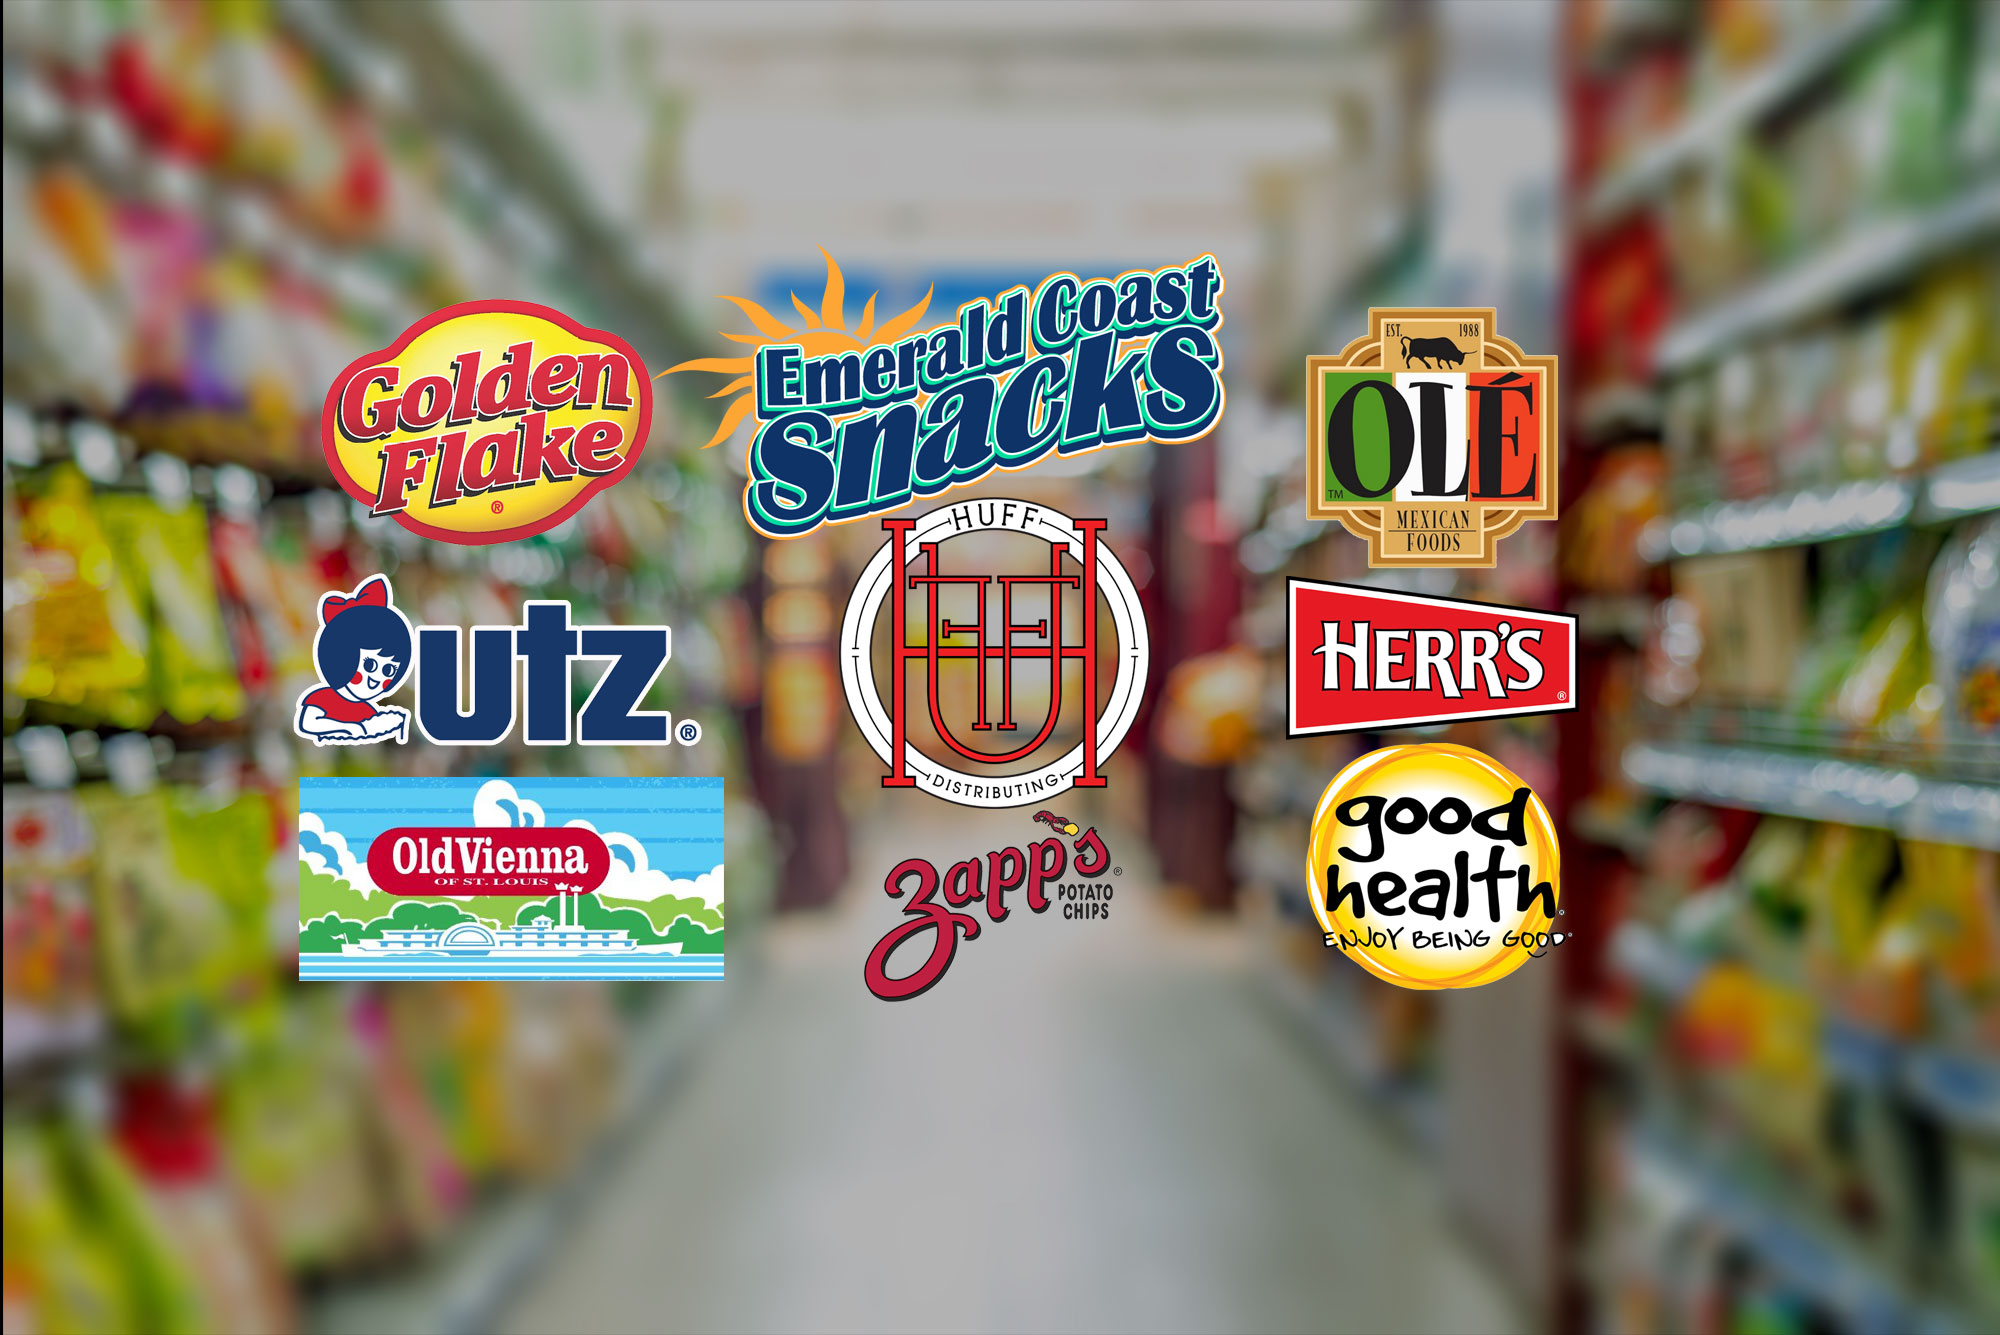 Emerald Coast Snacks - Huff Distributing